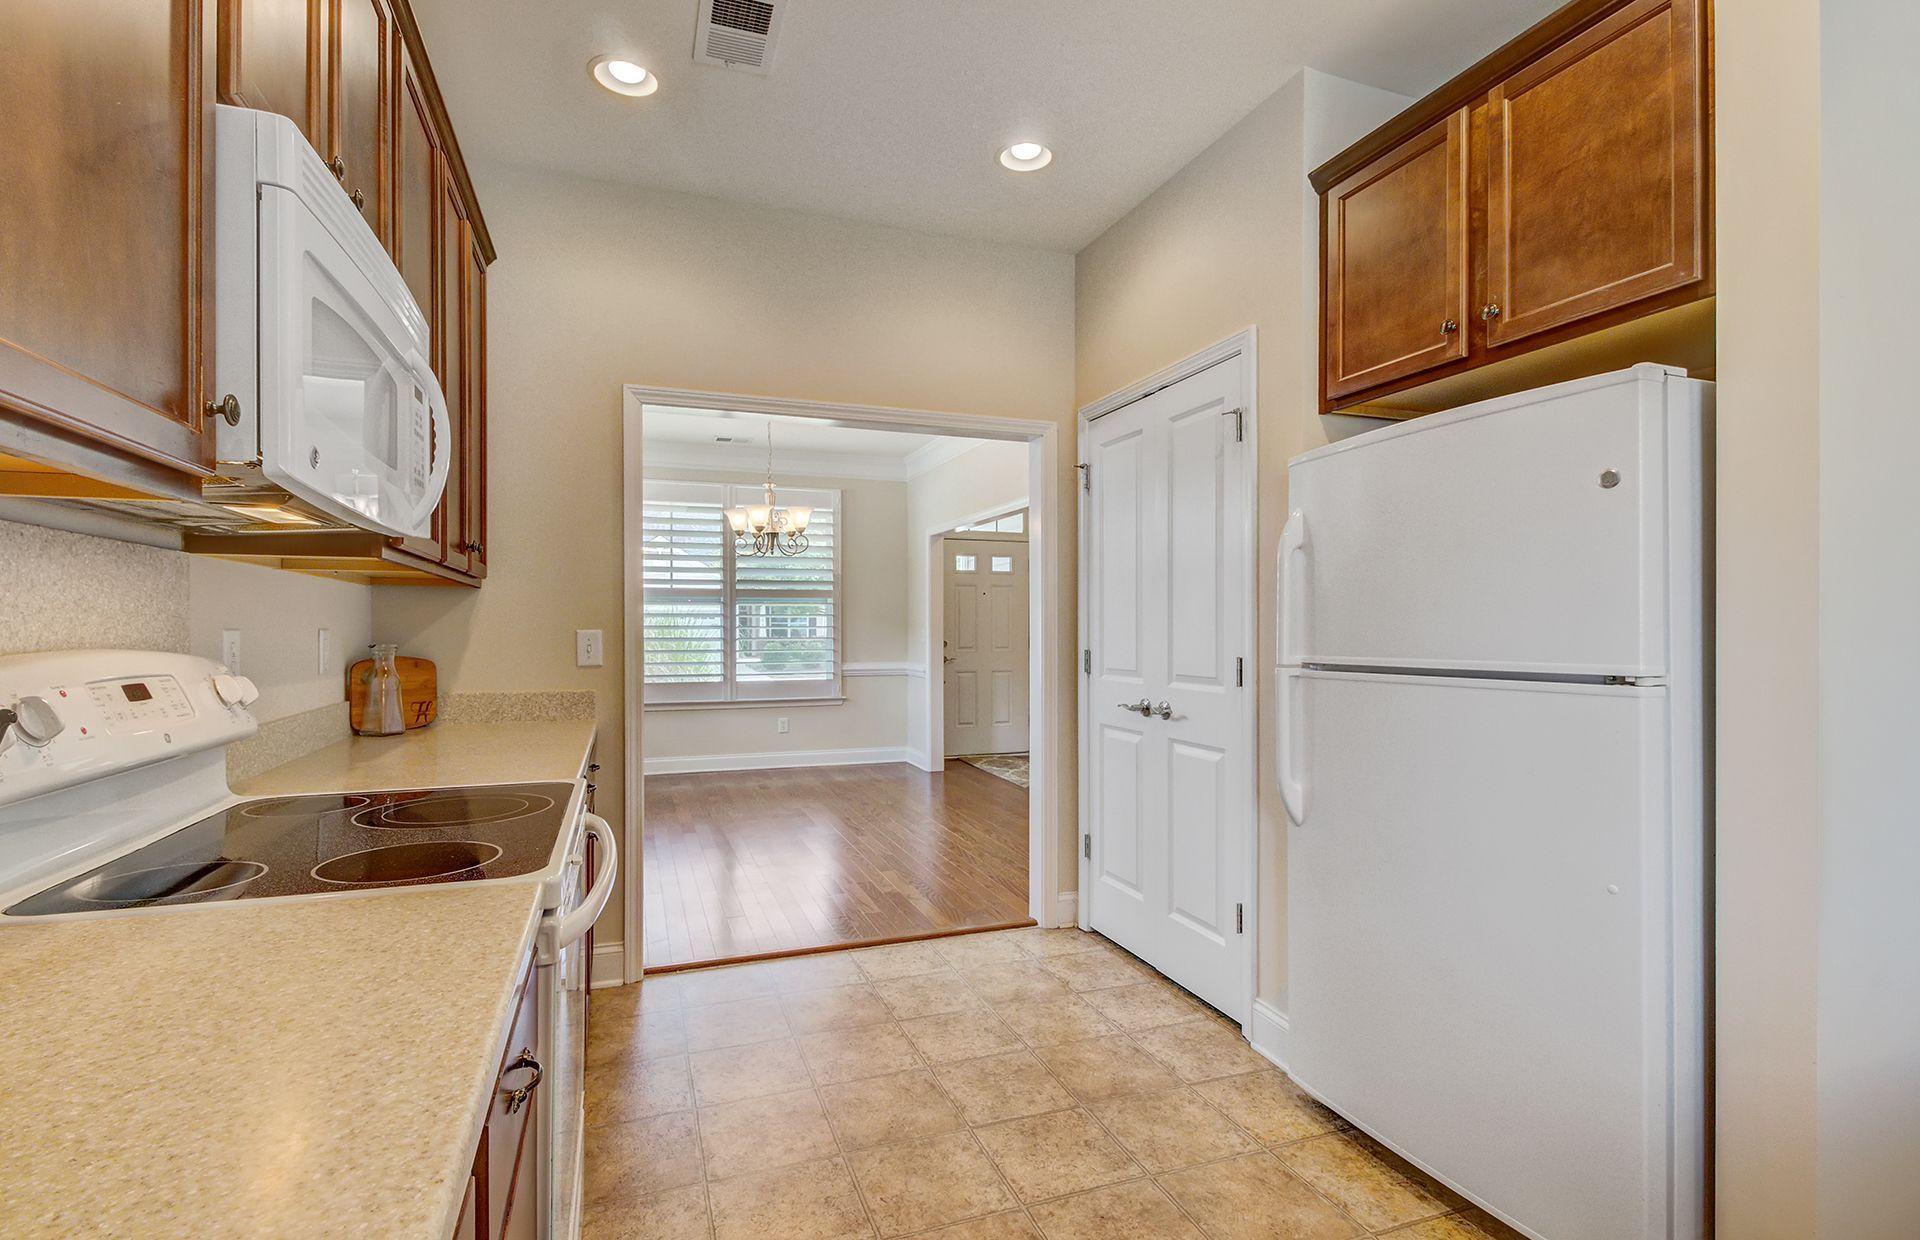 Linnen Place Homes For Sale - 1275 Shingleback, Mount Pleasant, SC - 29